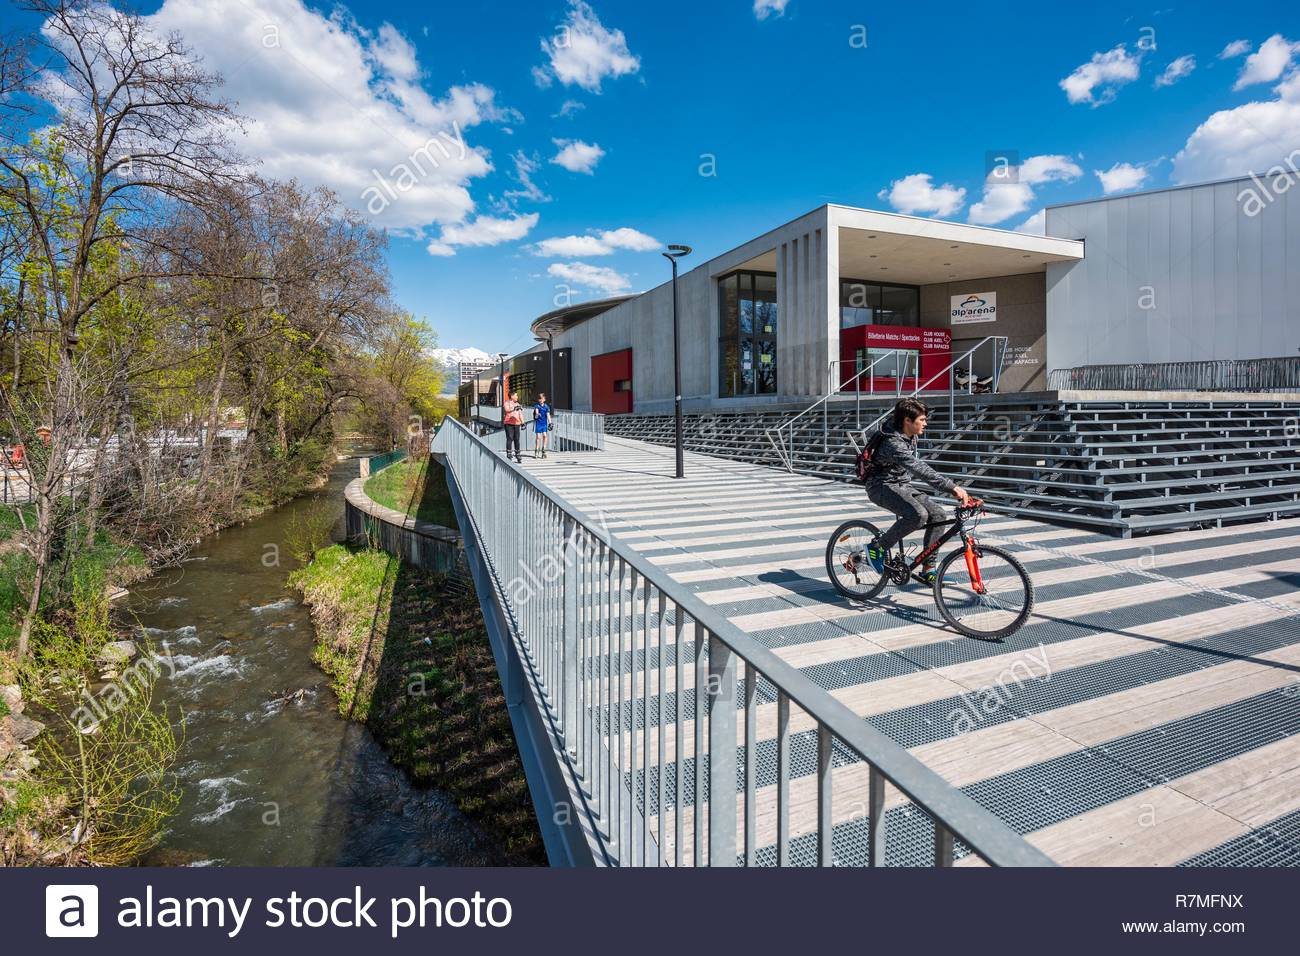 France, Hautes-Alpes, Gap, departmental capital, Alp'Arena hockey arena, former Brown-Ferrand Ice Rink - Stock Image